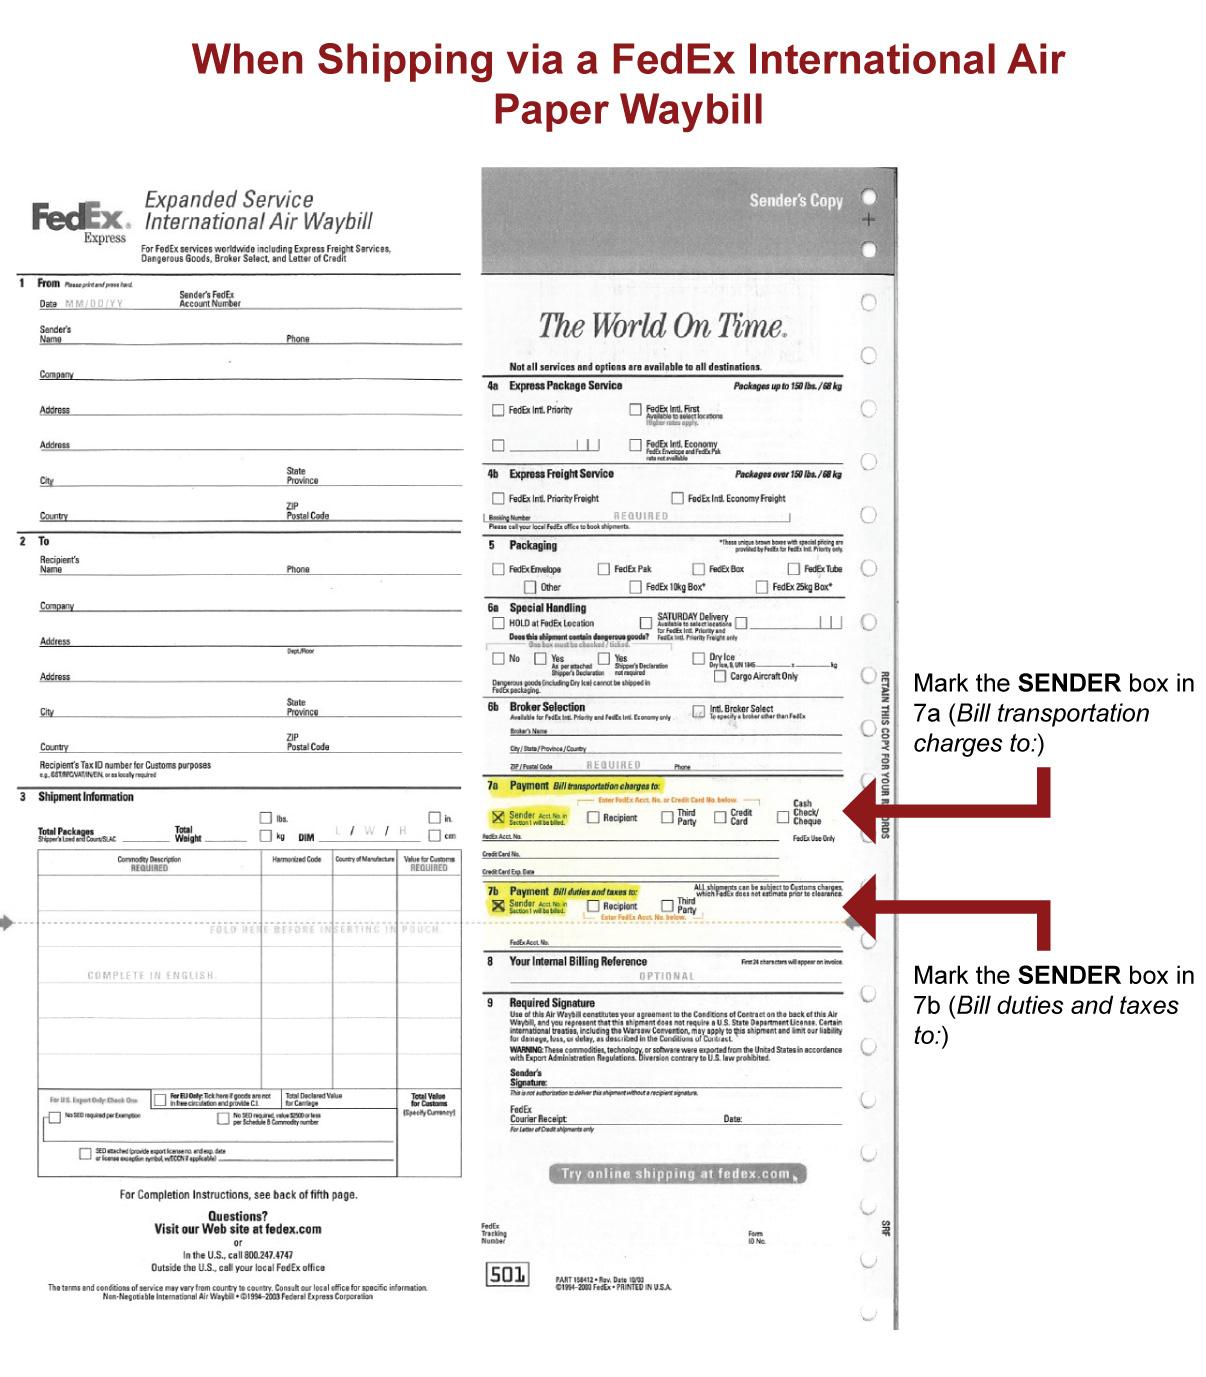 FedEx waybill form help.